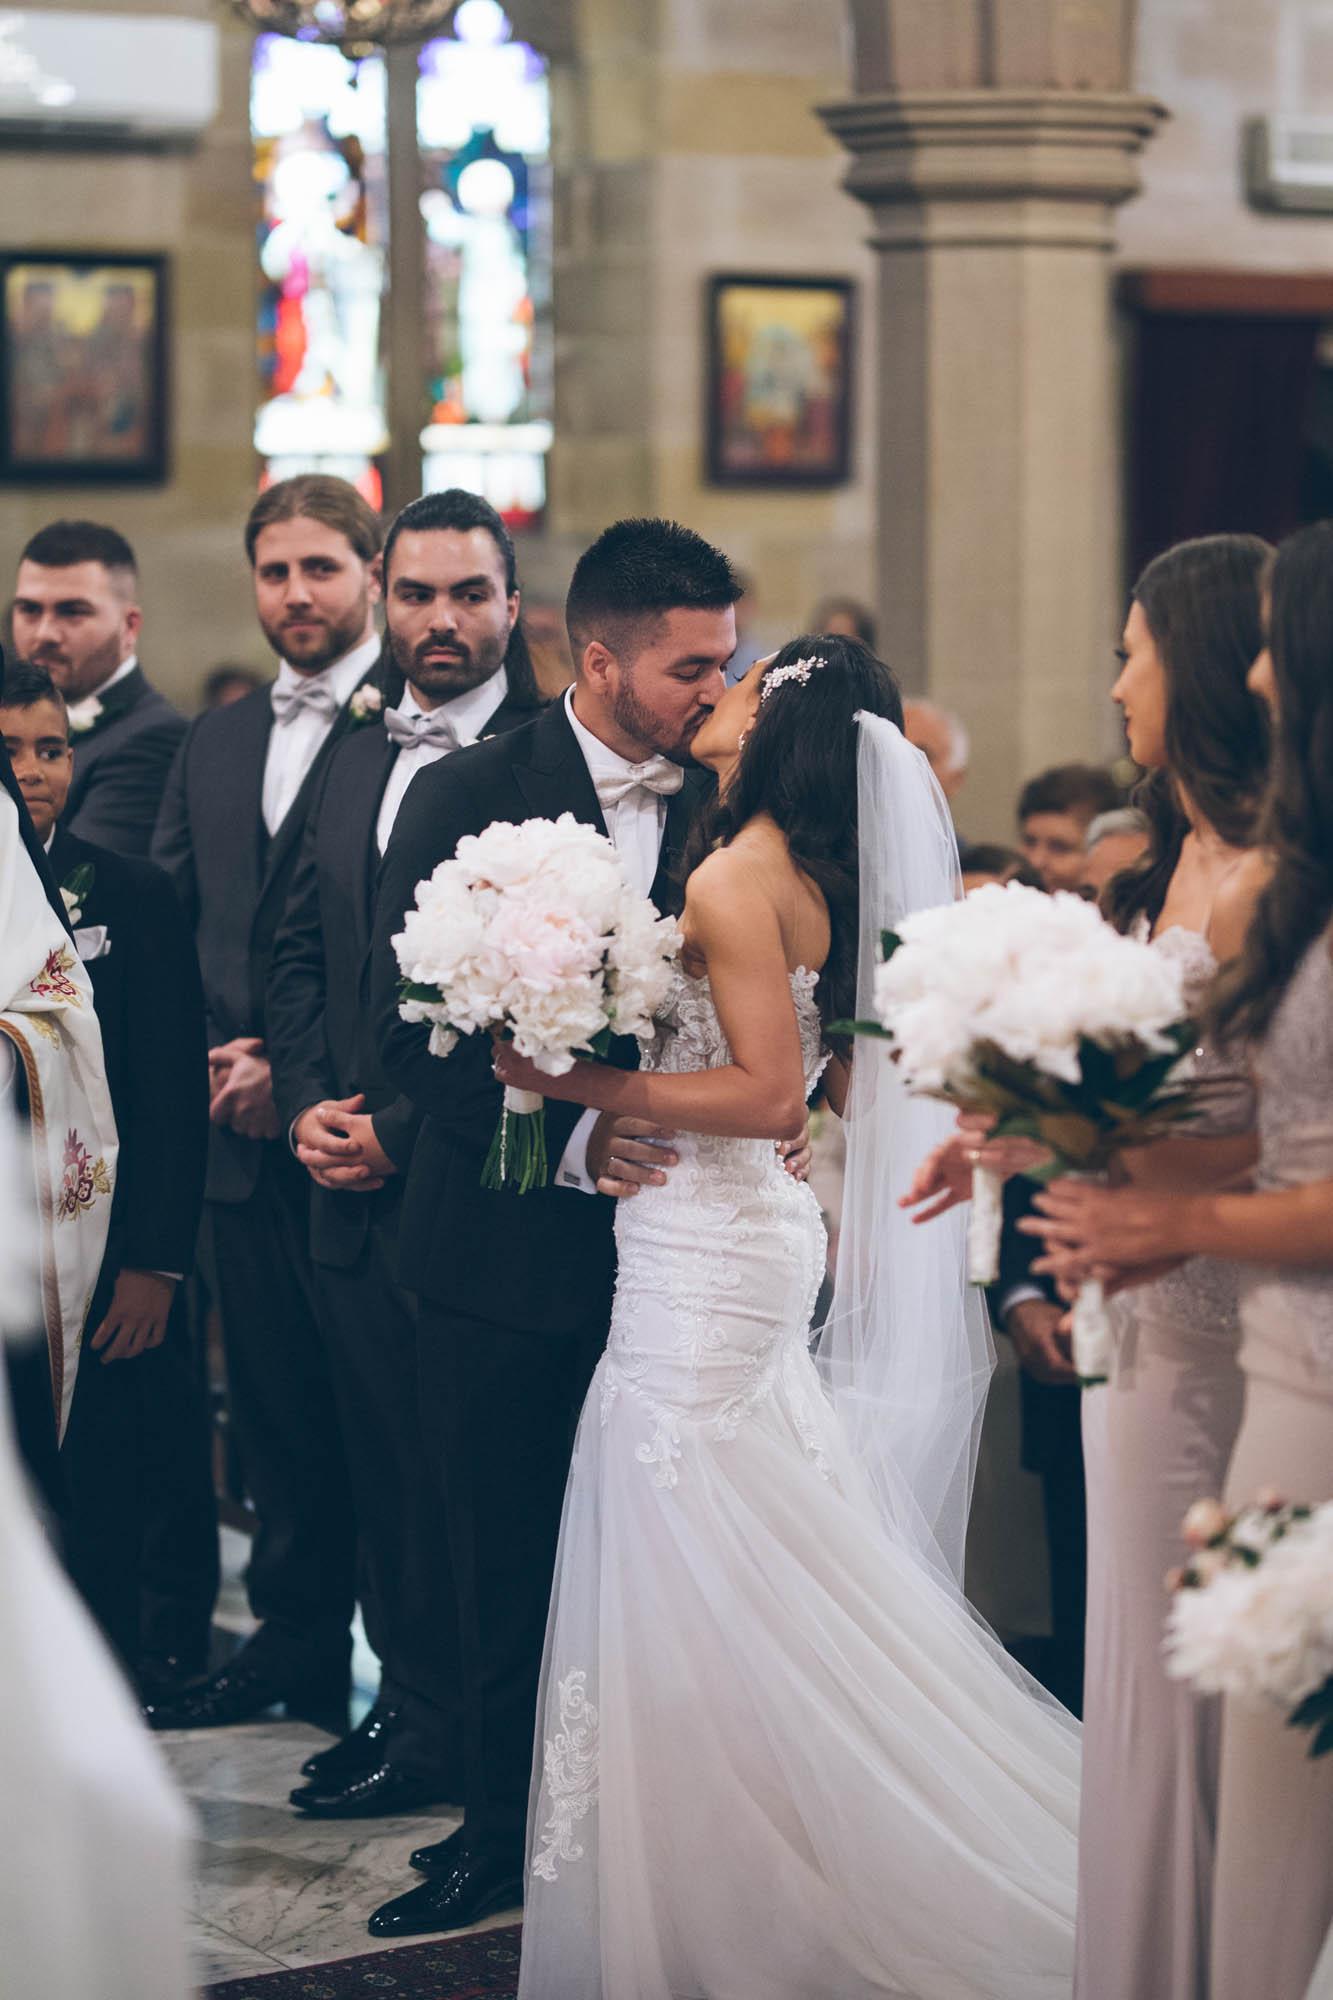 MacDougall-Photography-Sydney-Wedding-Photographers-20.jpg